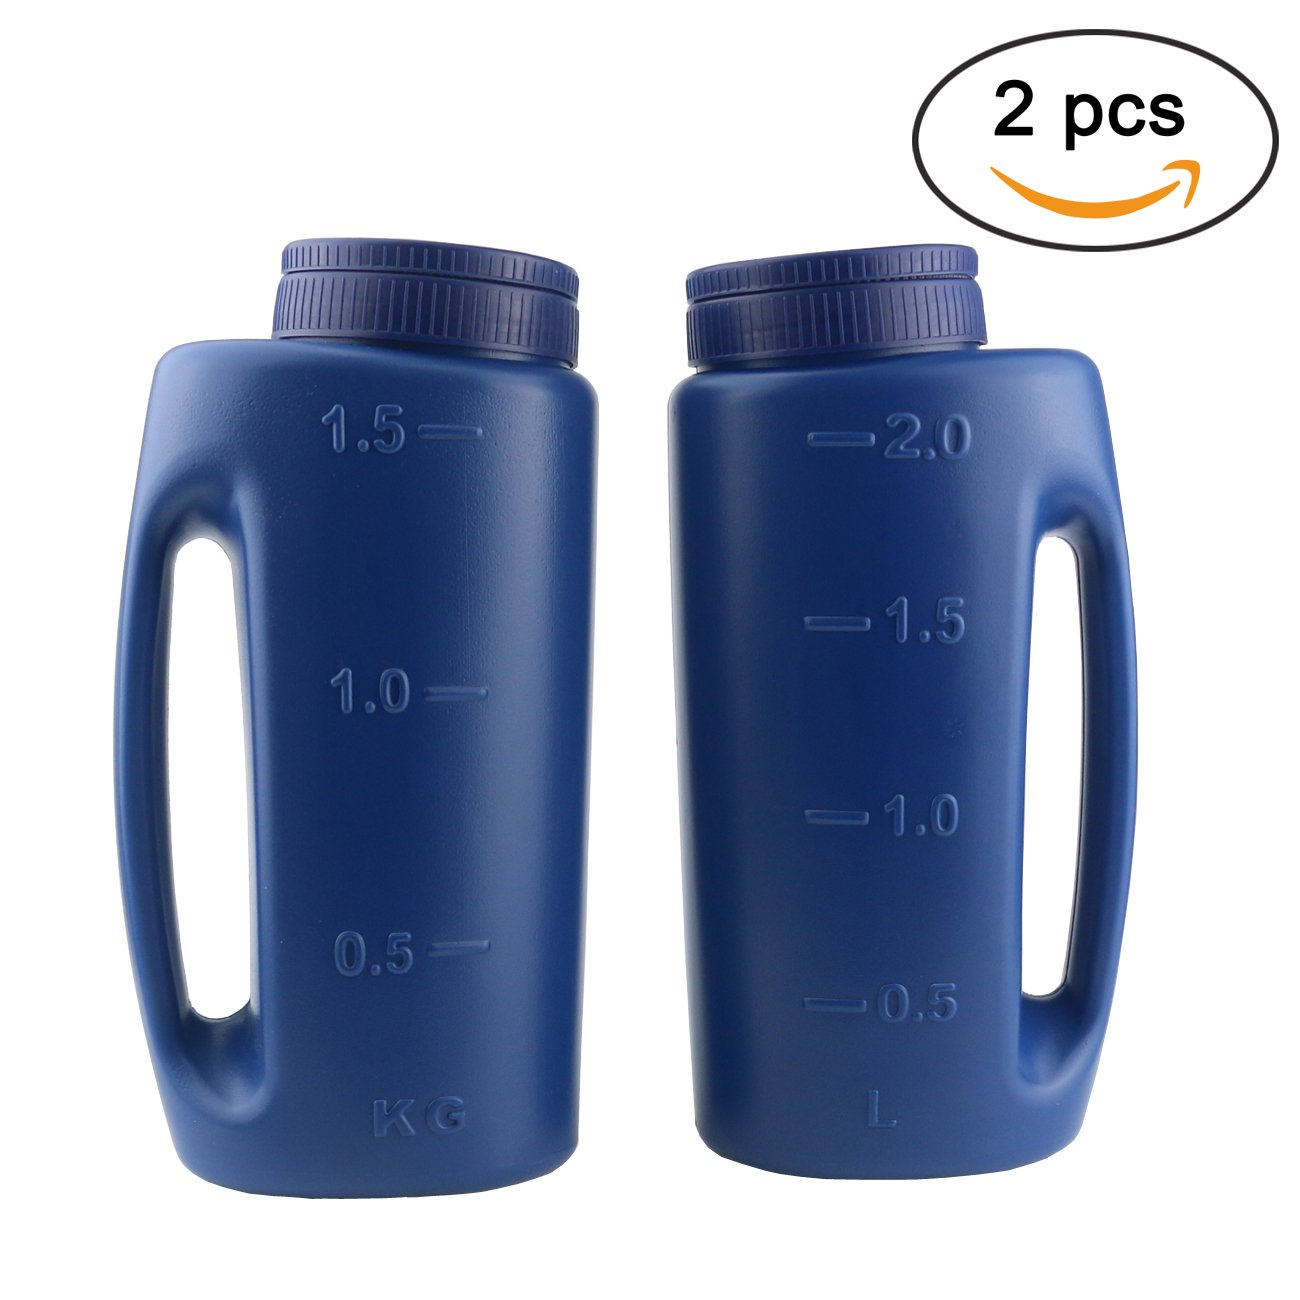 Ogrmar 2PCS Handheld Spreader Adjustable Hole Size Salt and Seed SpreaderFertilizer Seeds Calcium Chloride Insect Repellent Ice Melter De Icer (Blue)